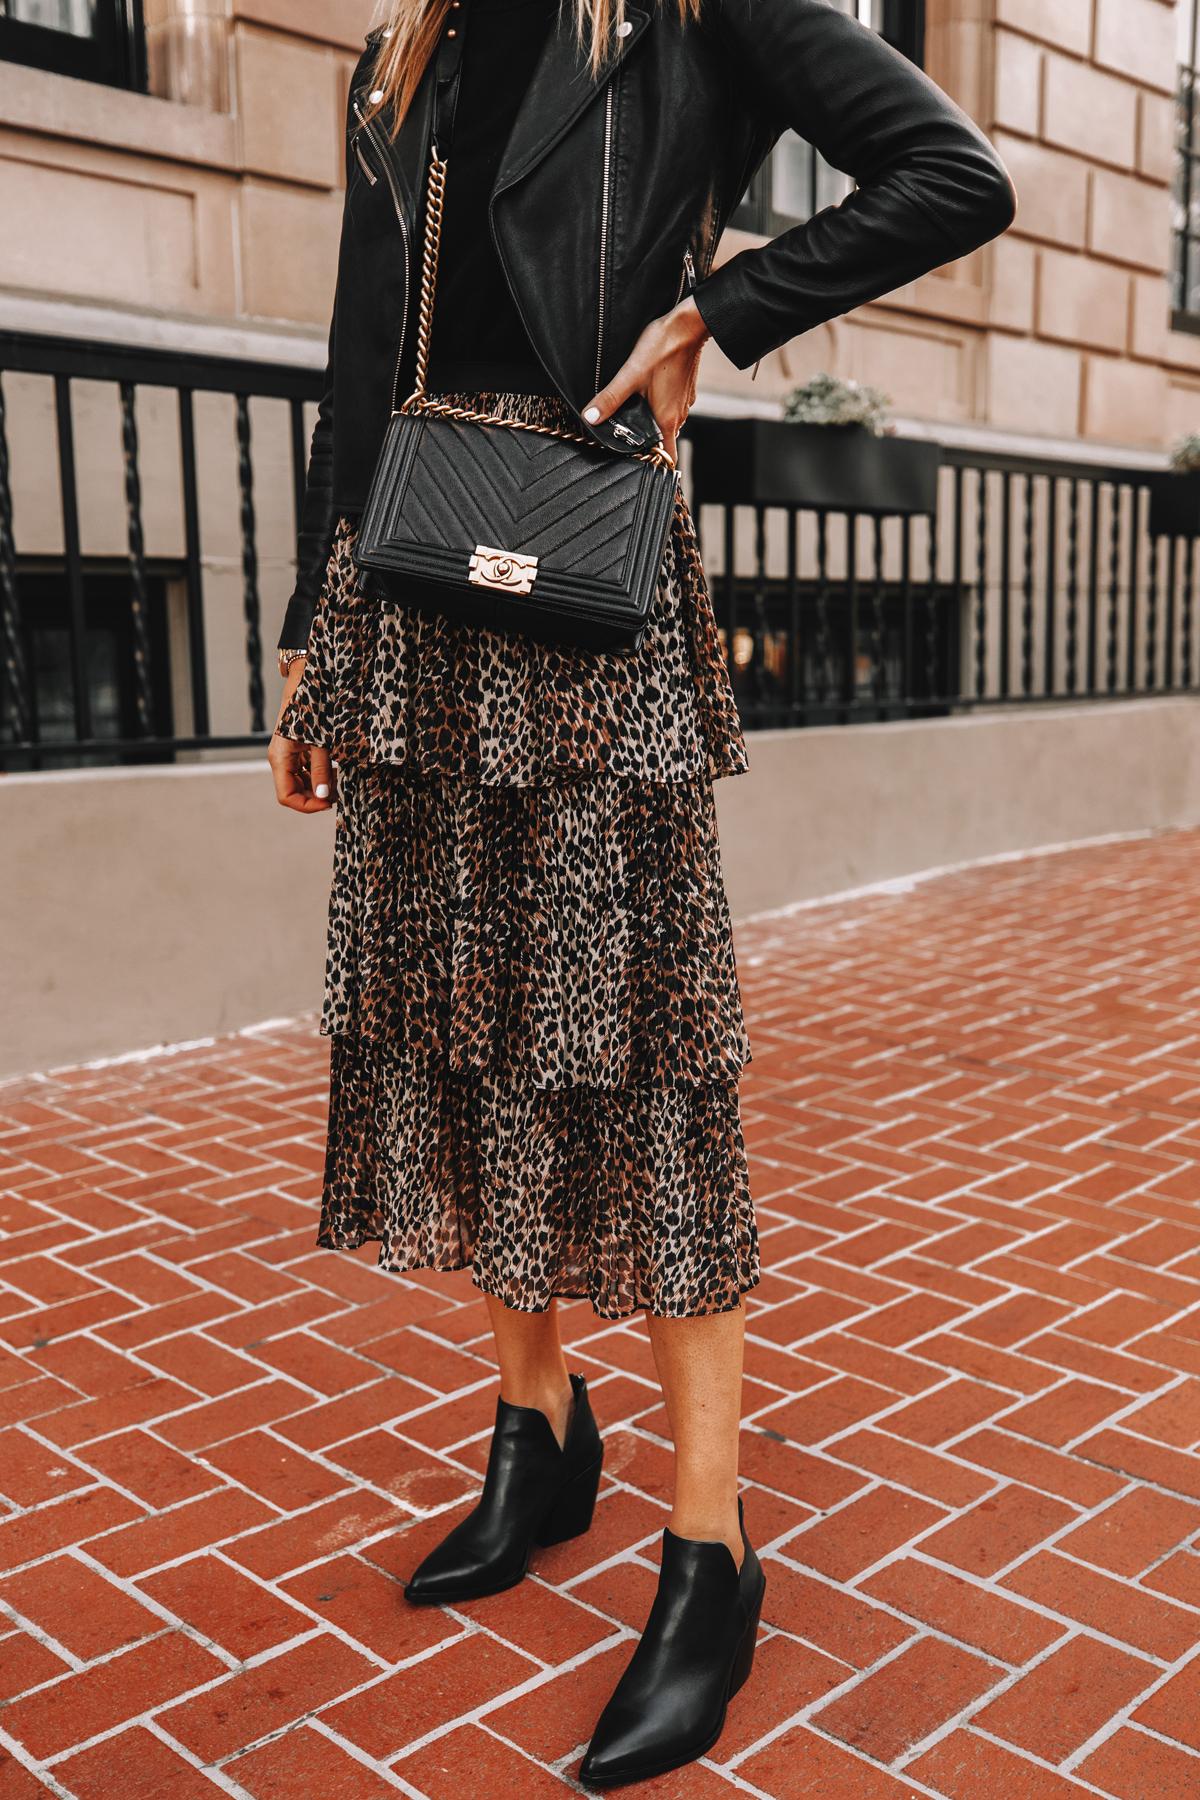 Fashion Jackson Wearing Black Leather Jacket Black Sweater Topshop Leopard Tiered Midi Skirt Black Leather Booties